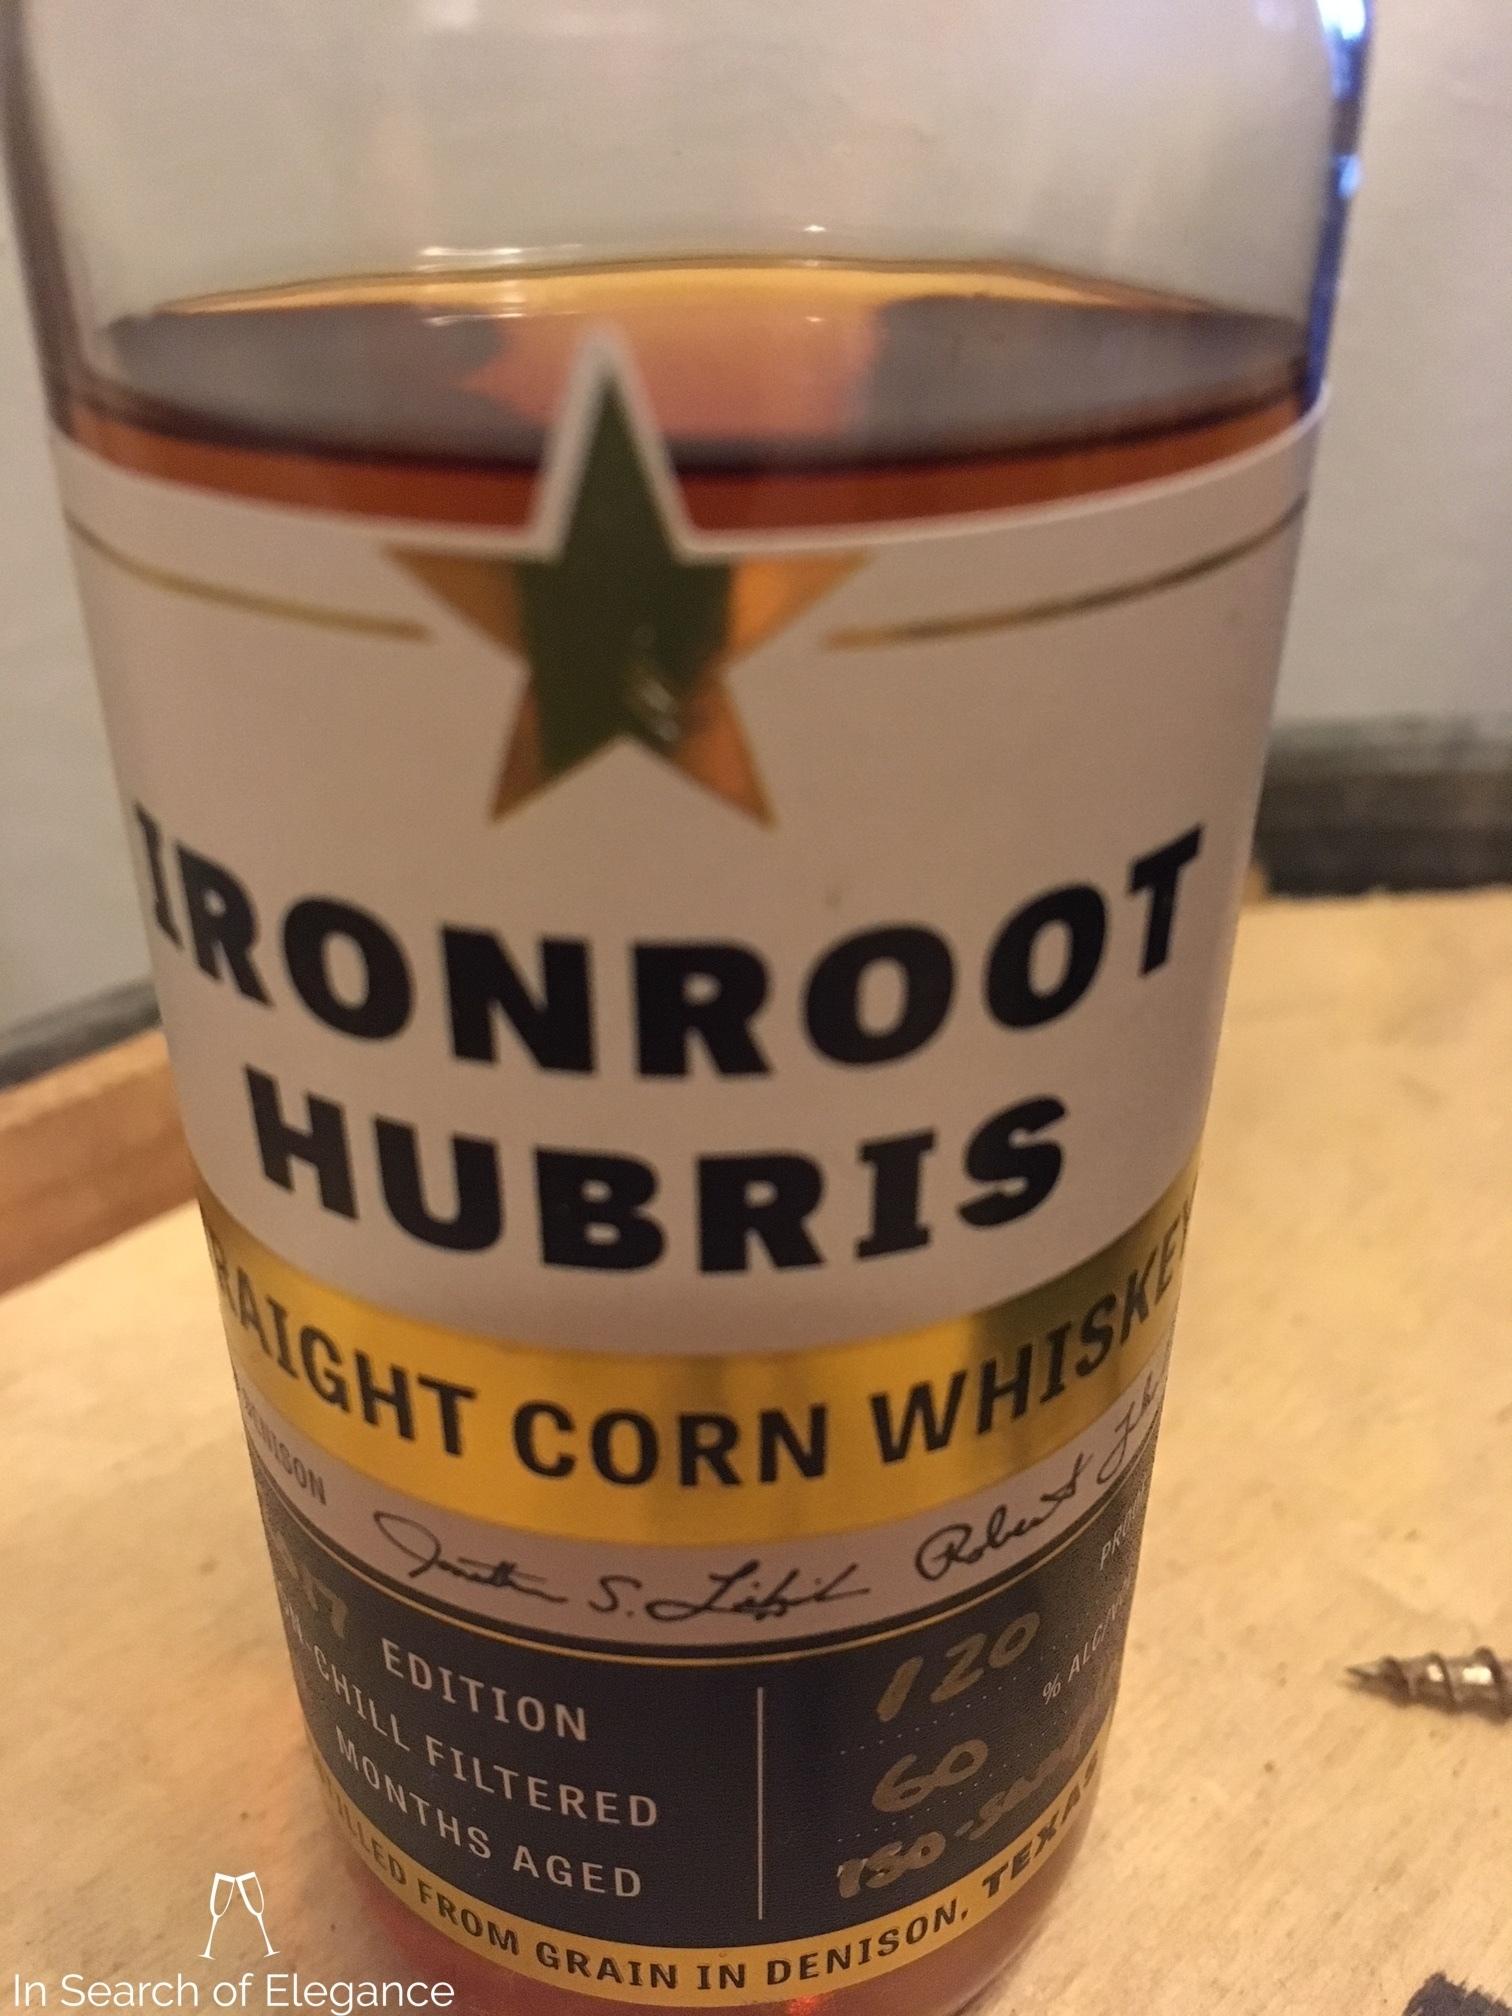 Ironroot Hubris.jpg